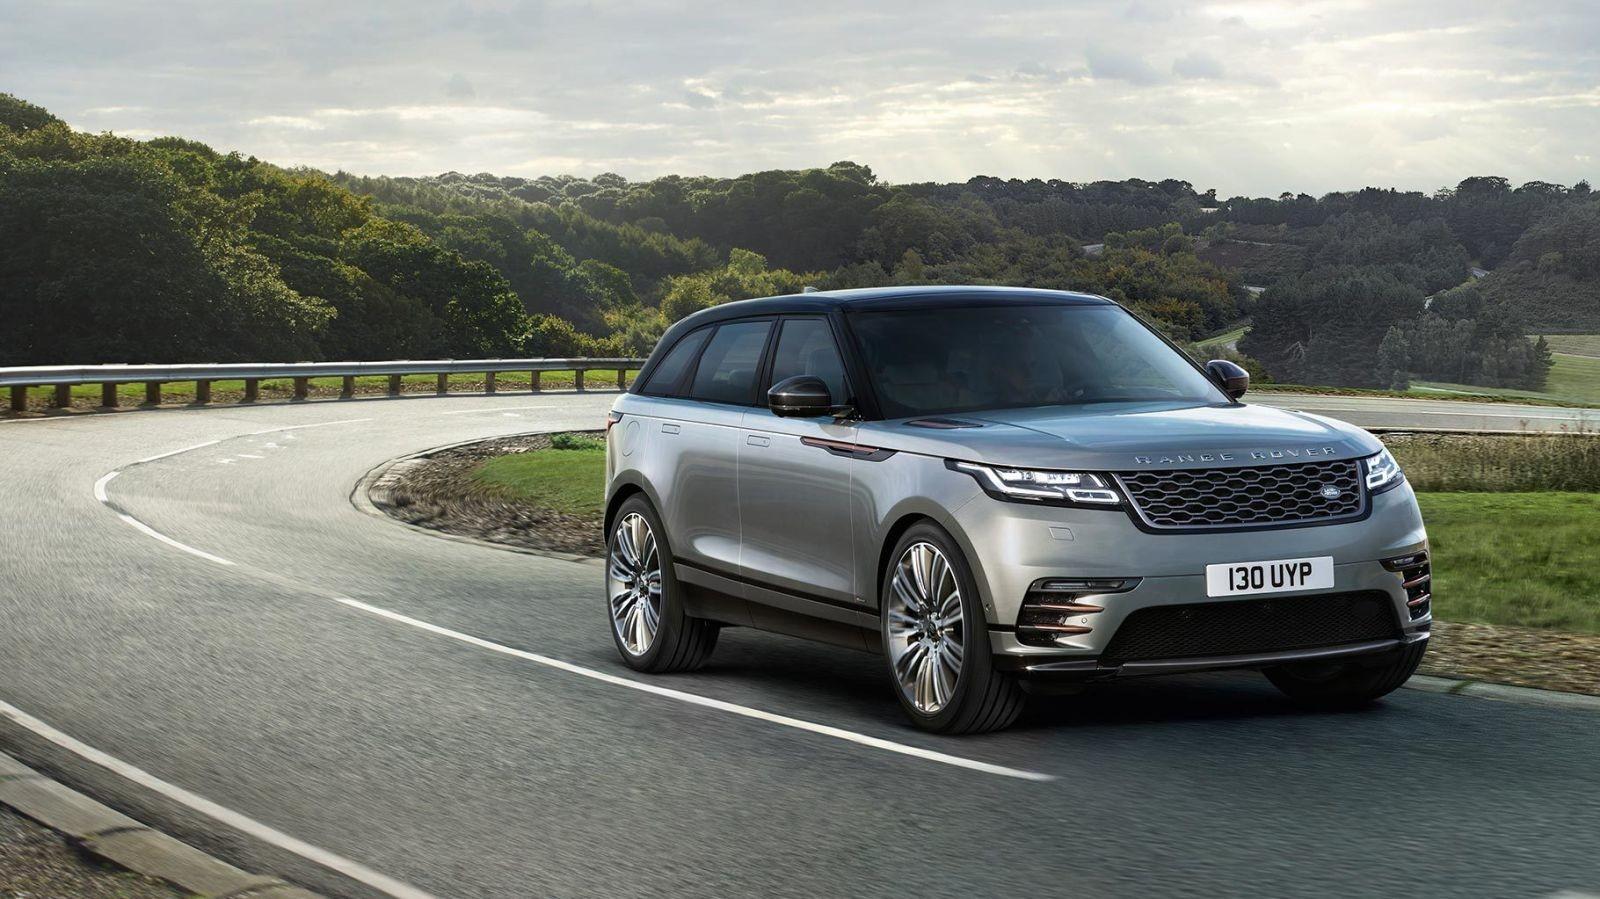 Range Rover Evoque Blacked Out >> Range Rover Velar India Launch In 2017?   Motoroids